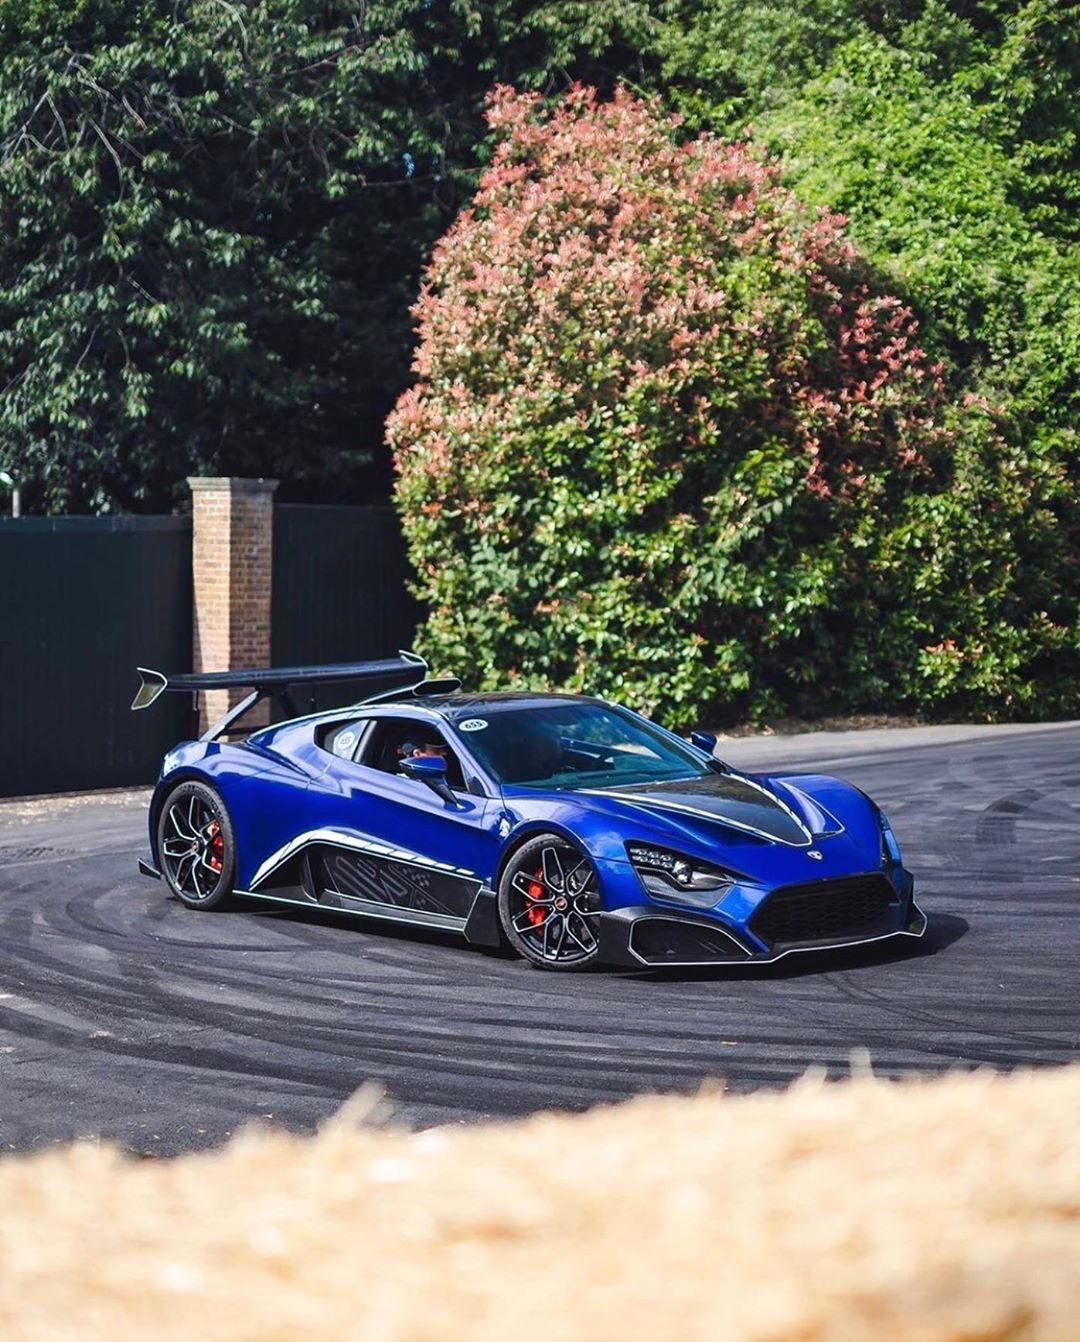 Royal Cars Magazine On Instagram Zenvo Tsr S Hot Or Not By Johnyautomotive Use Royalc Car Magazine Super Cars Sports Cars Luxury